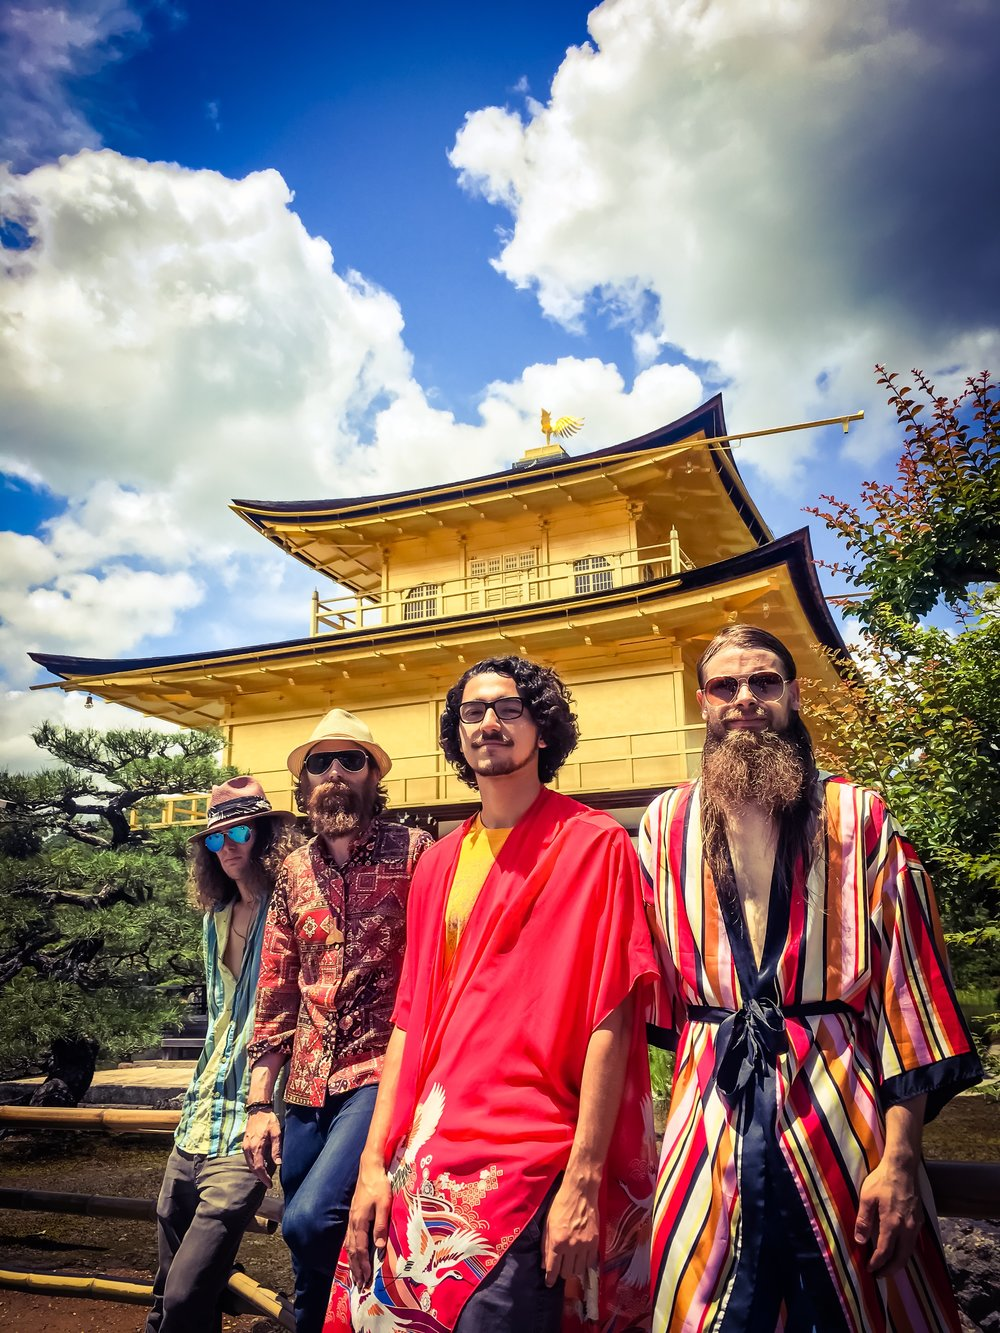 DESTINY Video Shoot at Kinkaku-Ji Temple in Tokyo